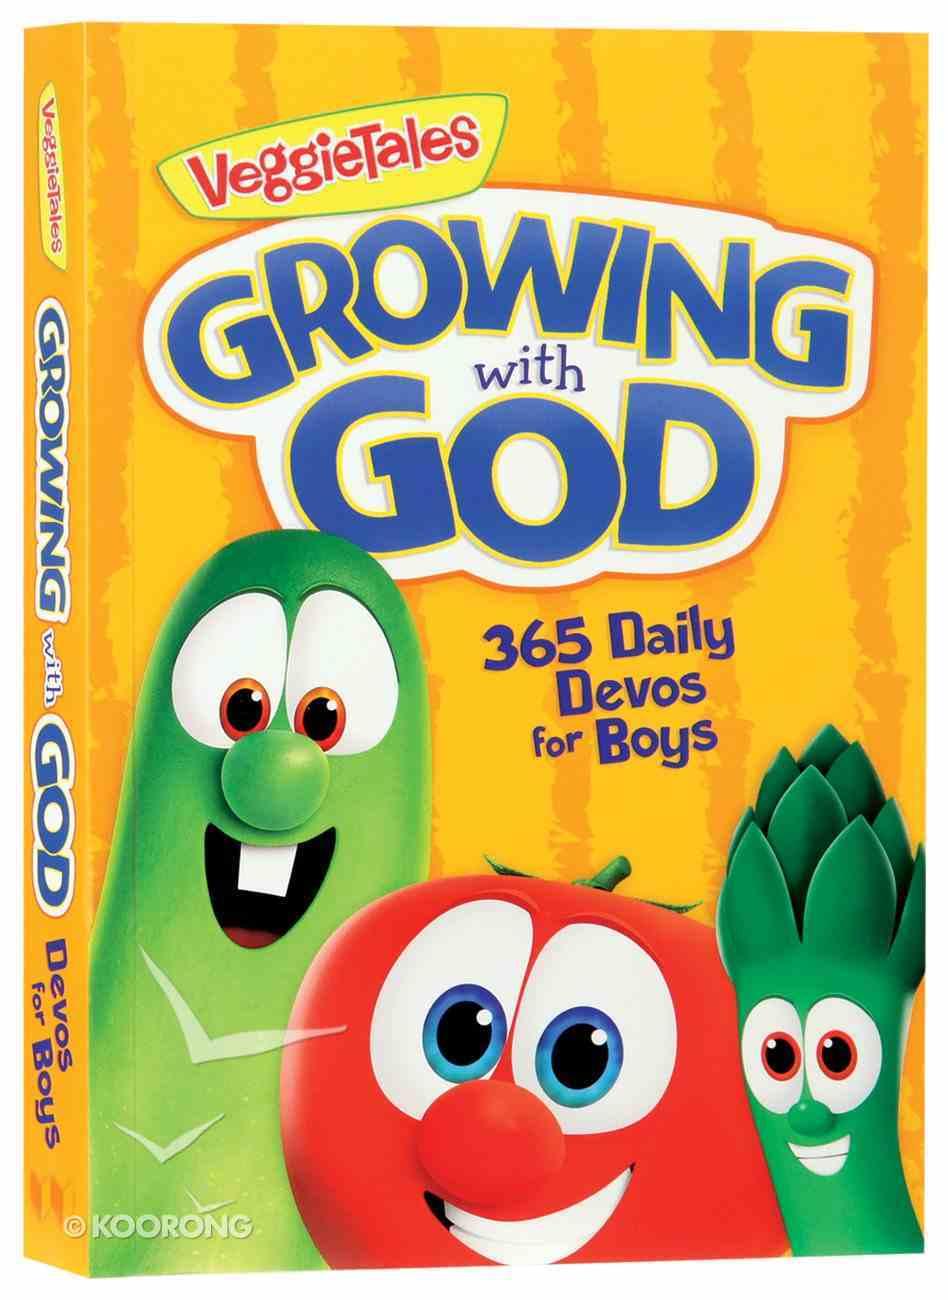 Growing With God: 365 Daily Devos For Boys (Veggie Tales (Veggietales) Series) Paperback